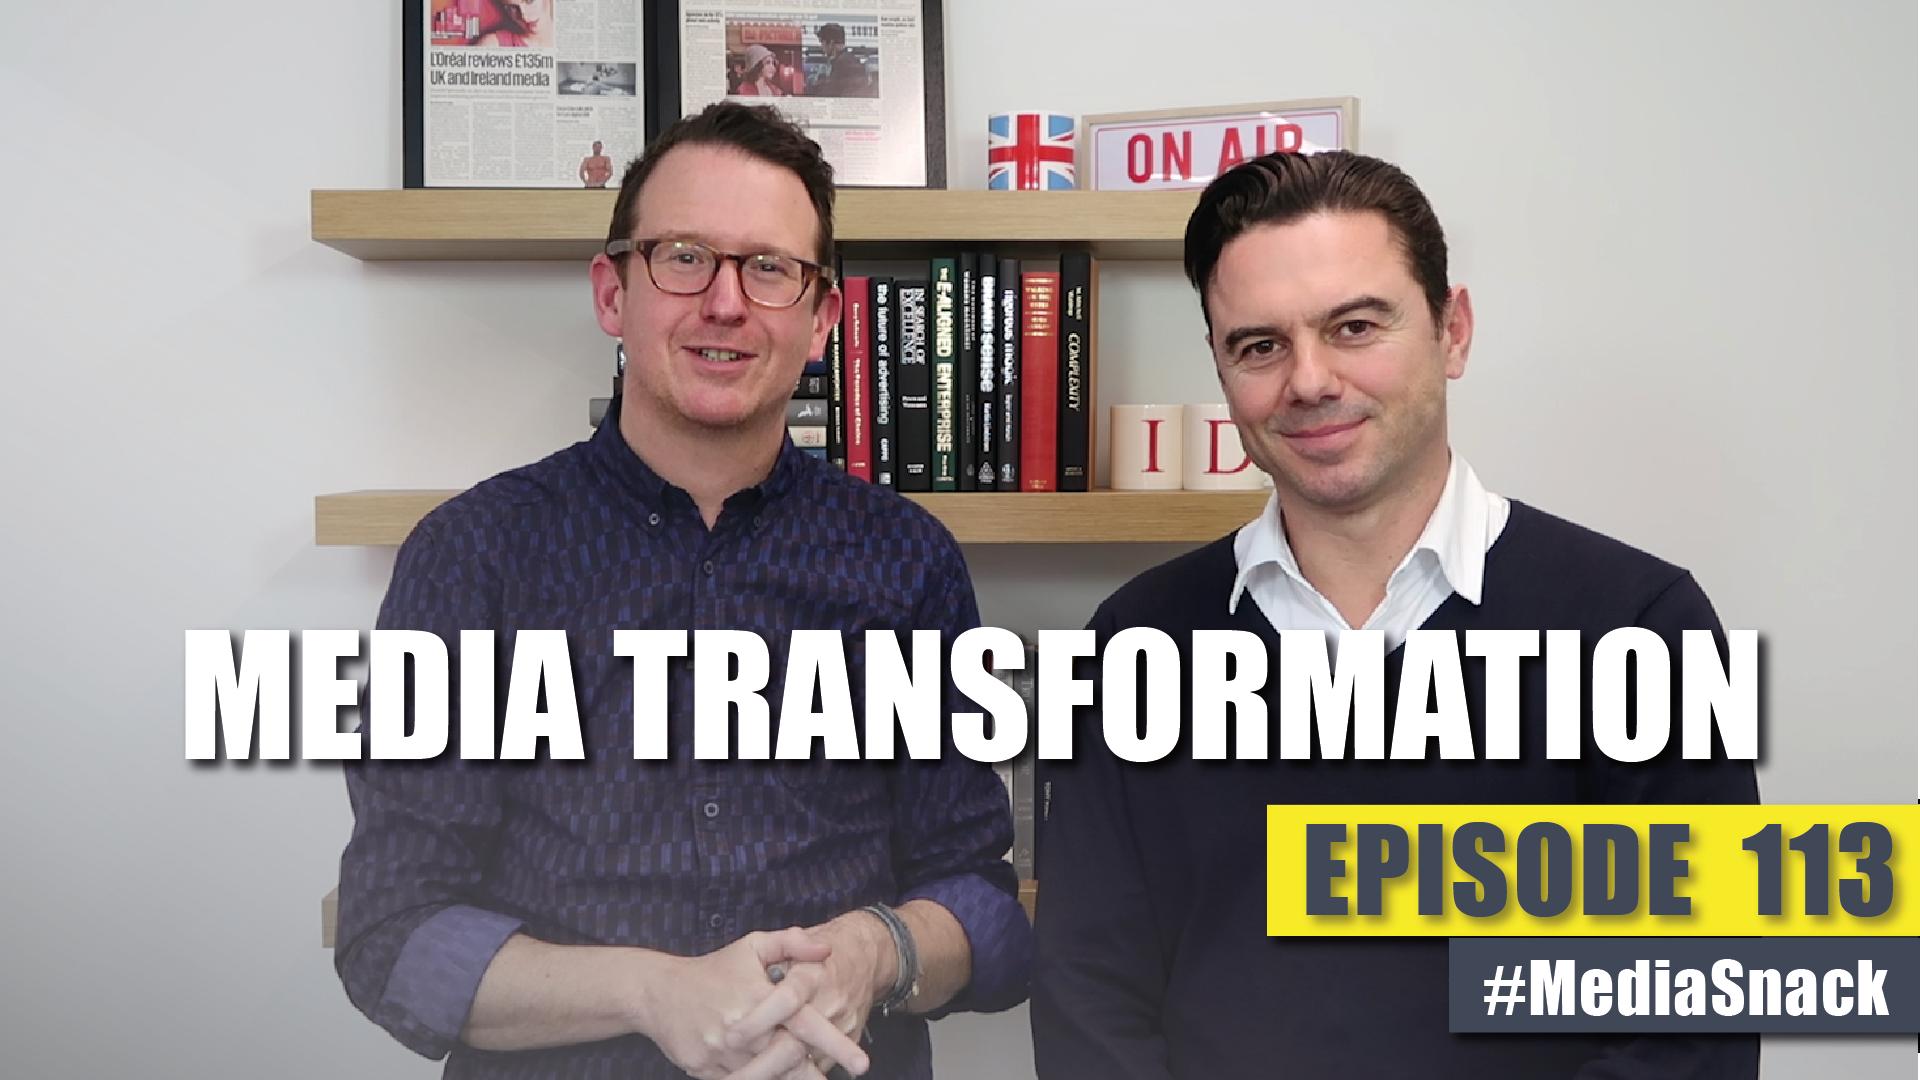 ID COMMS MEDIASNACK 113: Media Transformation